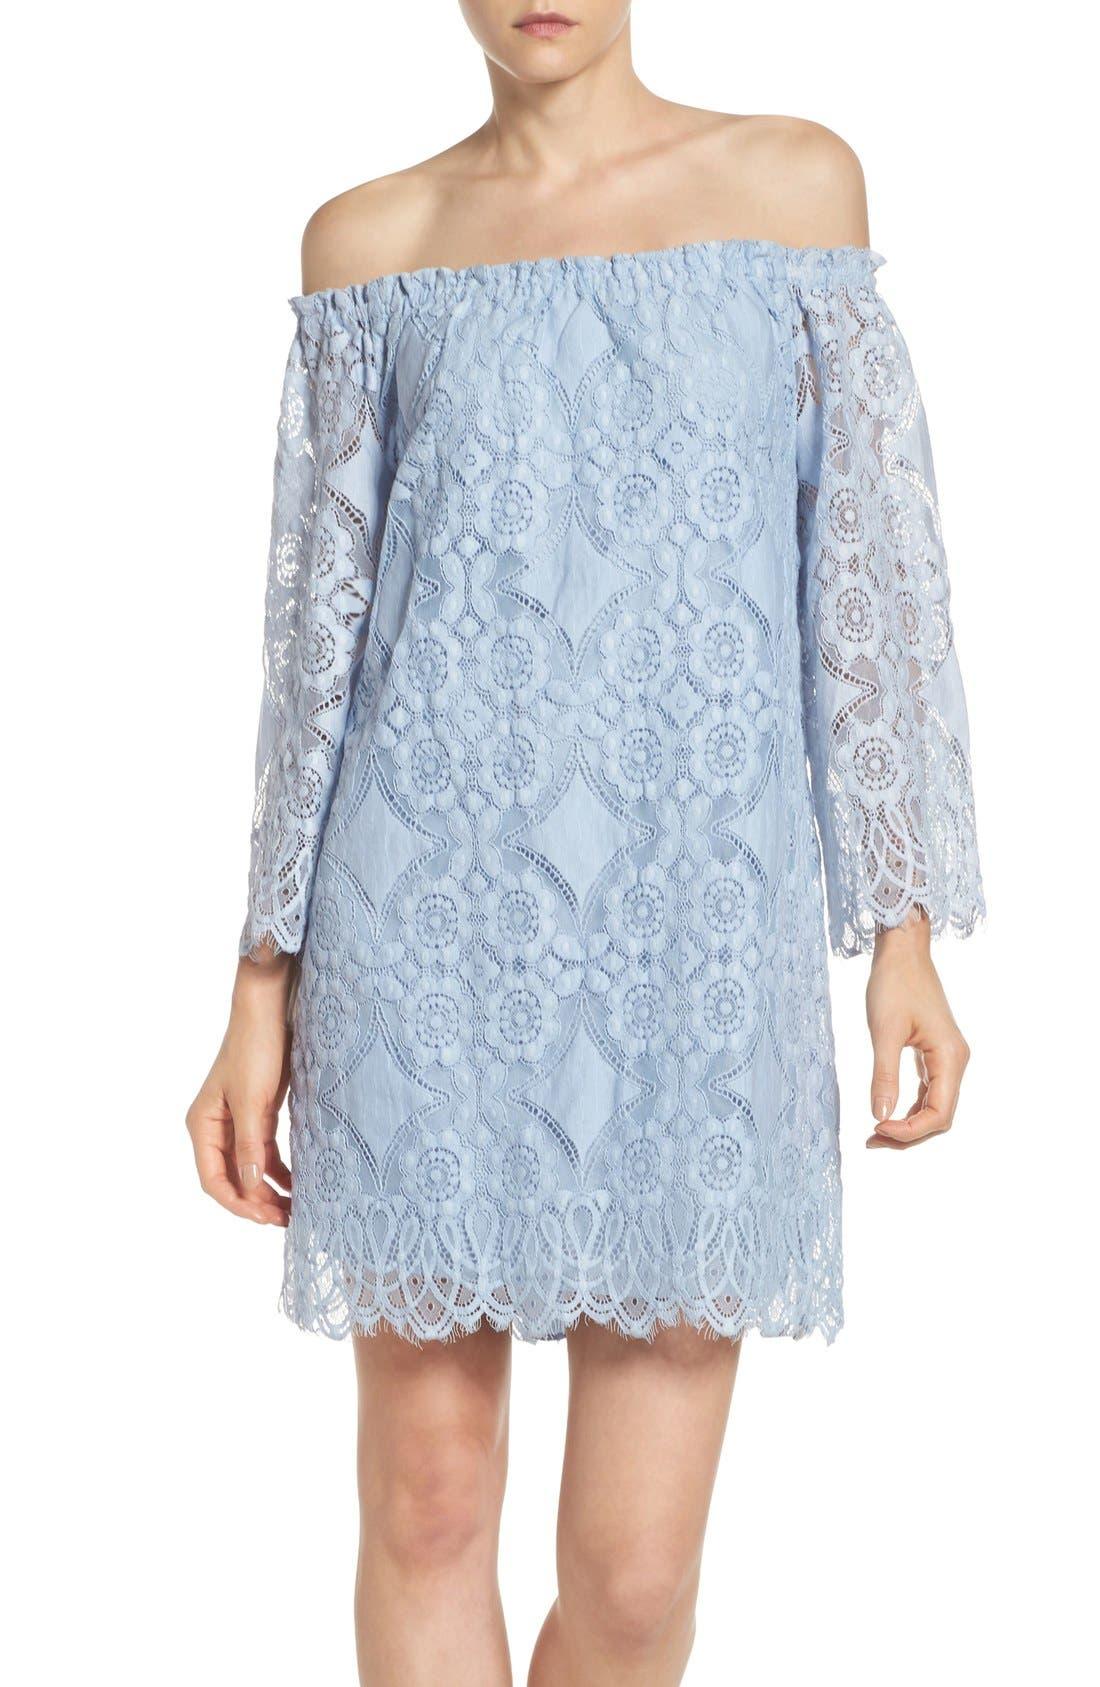 Alternate Image 1 Selected - BB Dakota Halden A-Line Dress